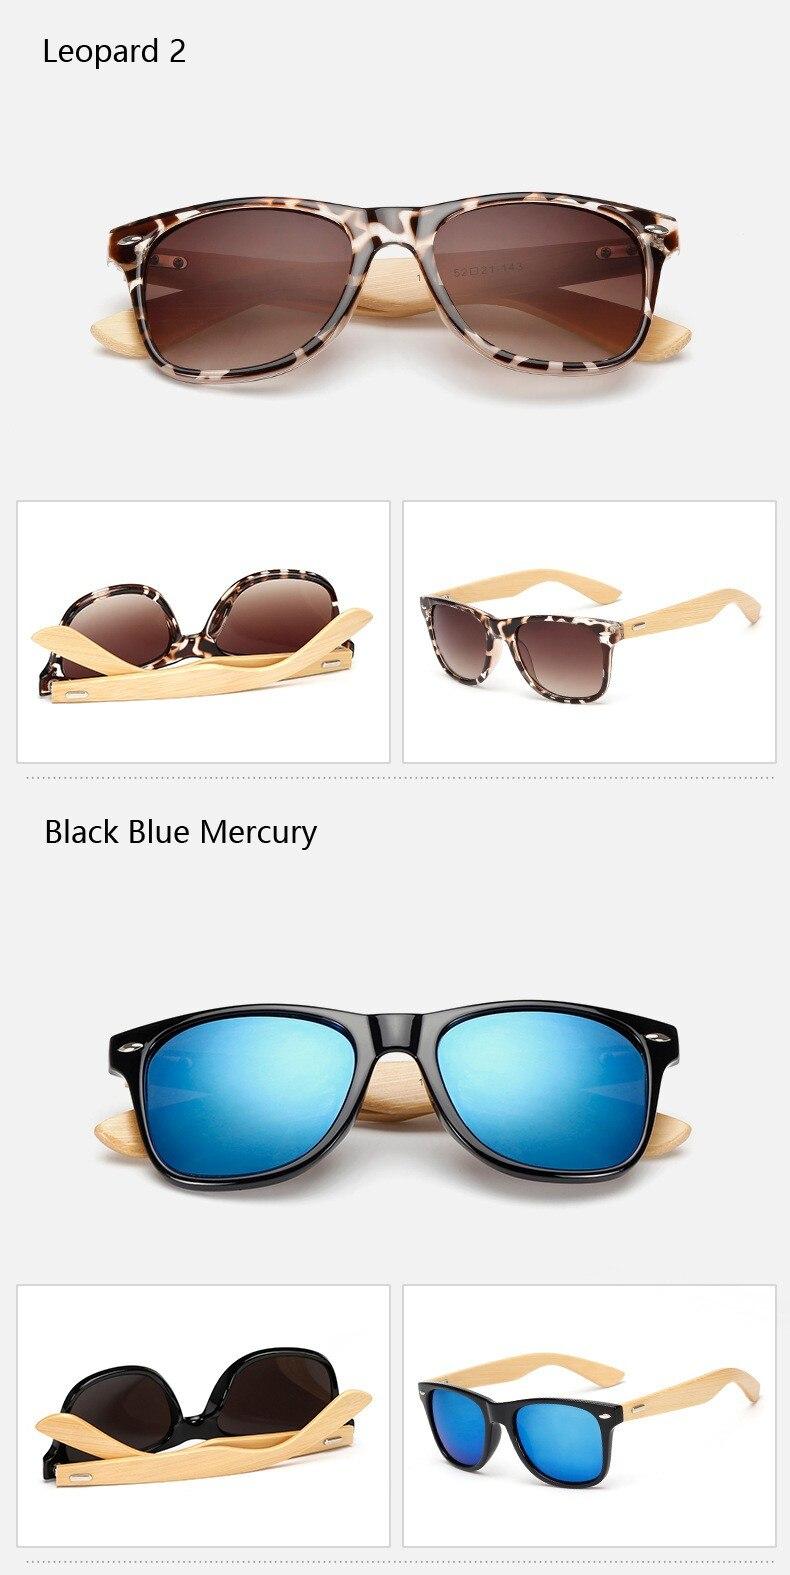 Ralferty Retro Wood Sunglasses Men Bamboo Sunglass Women Brand Design Sport Goggles Gold Mirror Sun Glasses Shades lunette oculo 9